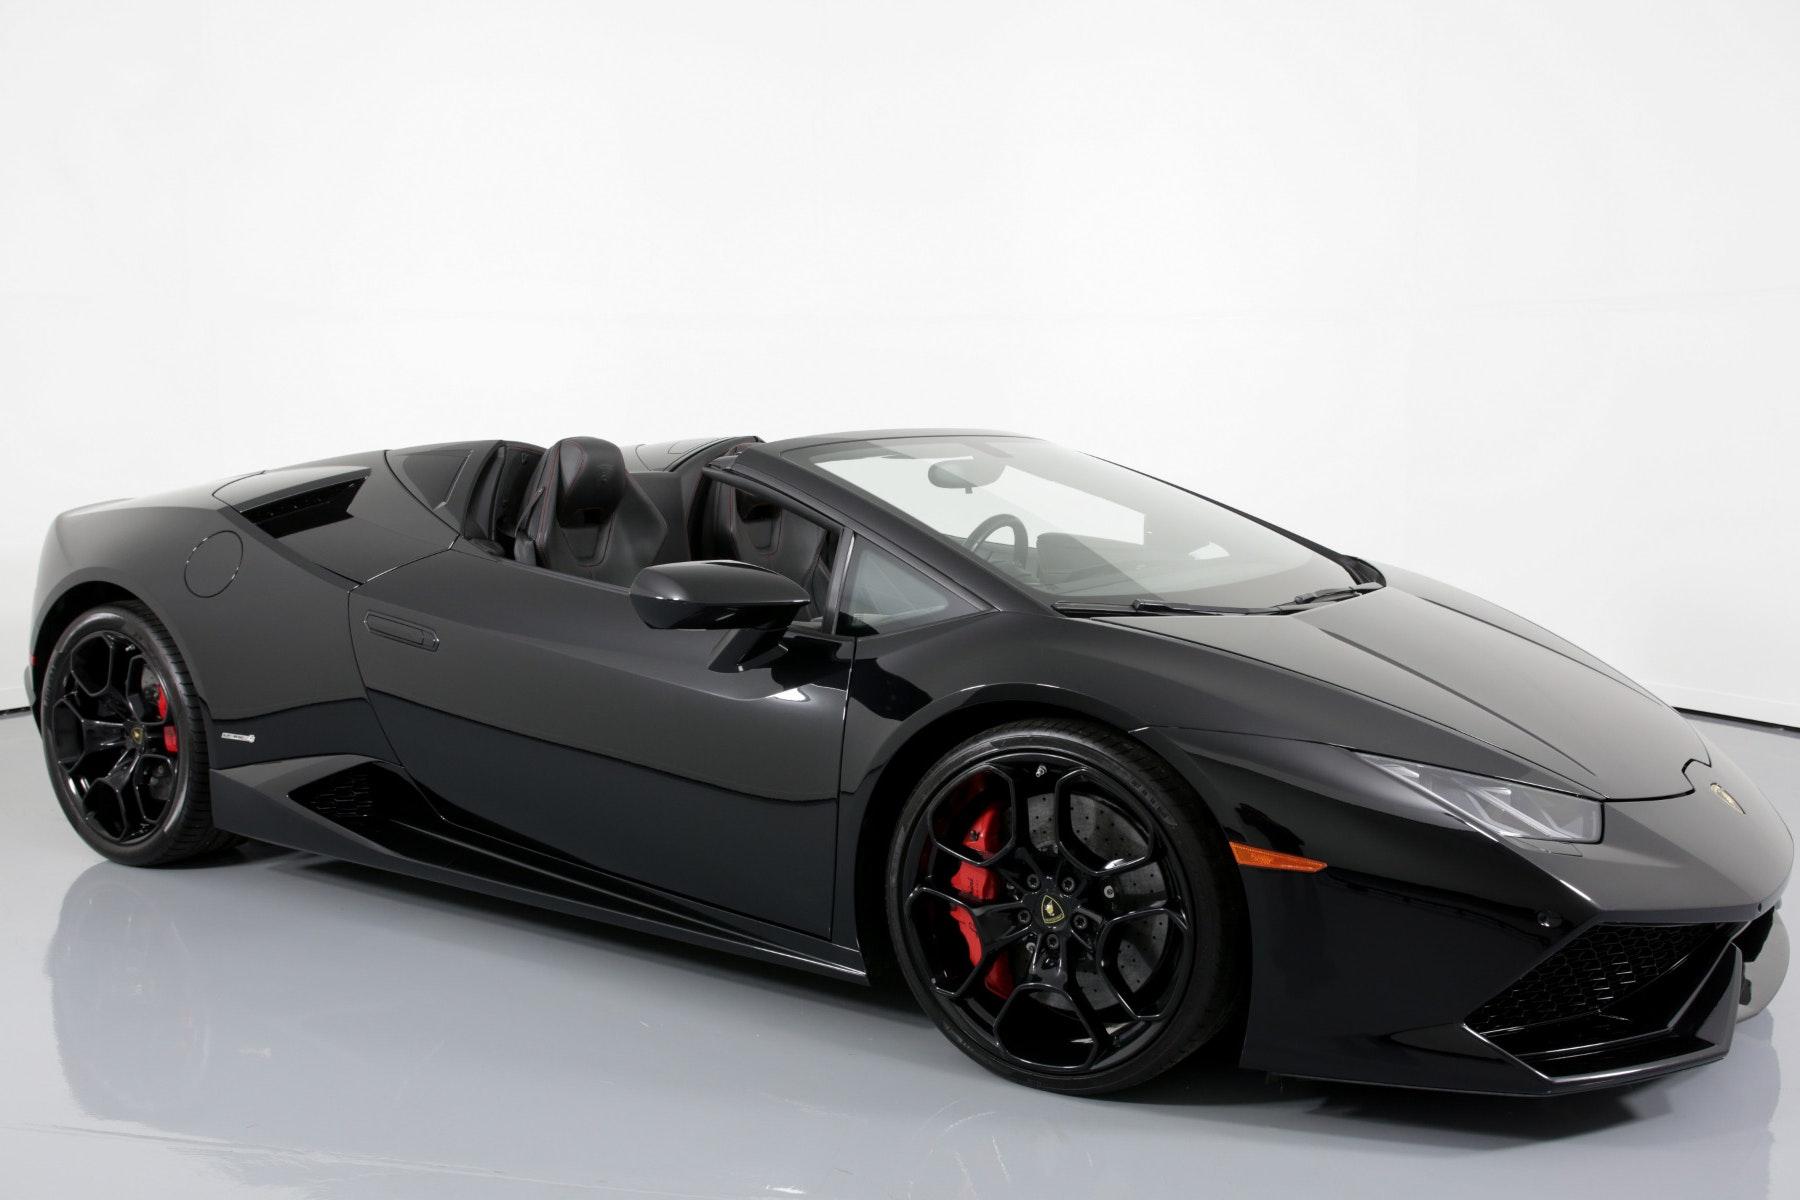 Miami 2017 Lamborghini Huracan image #1